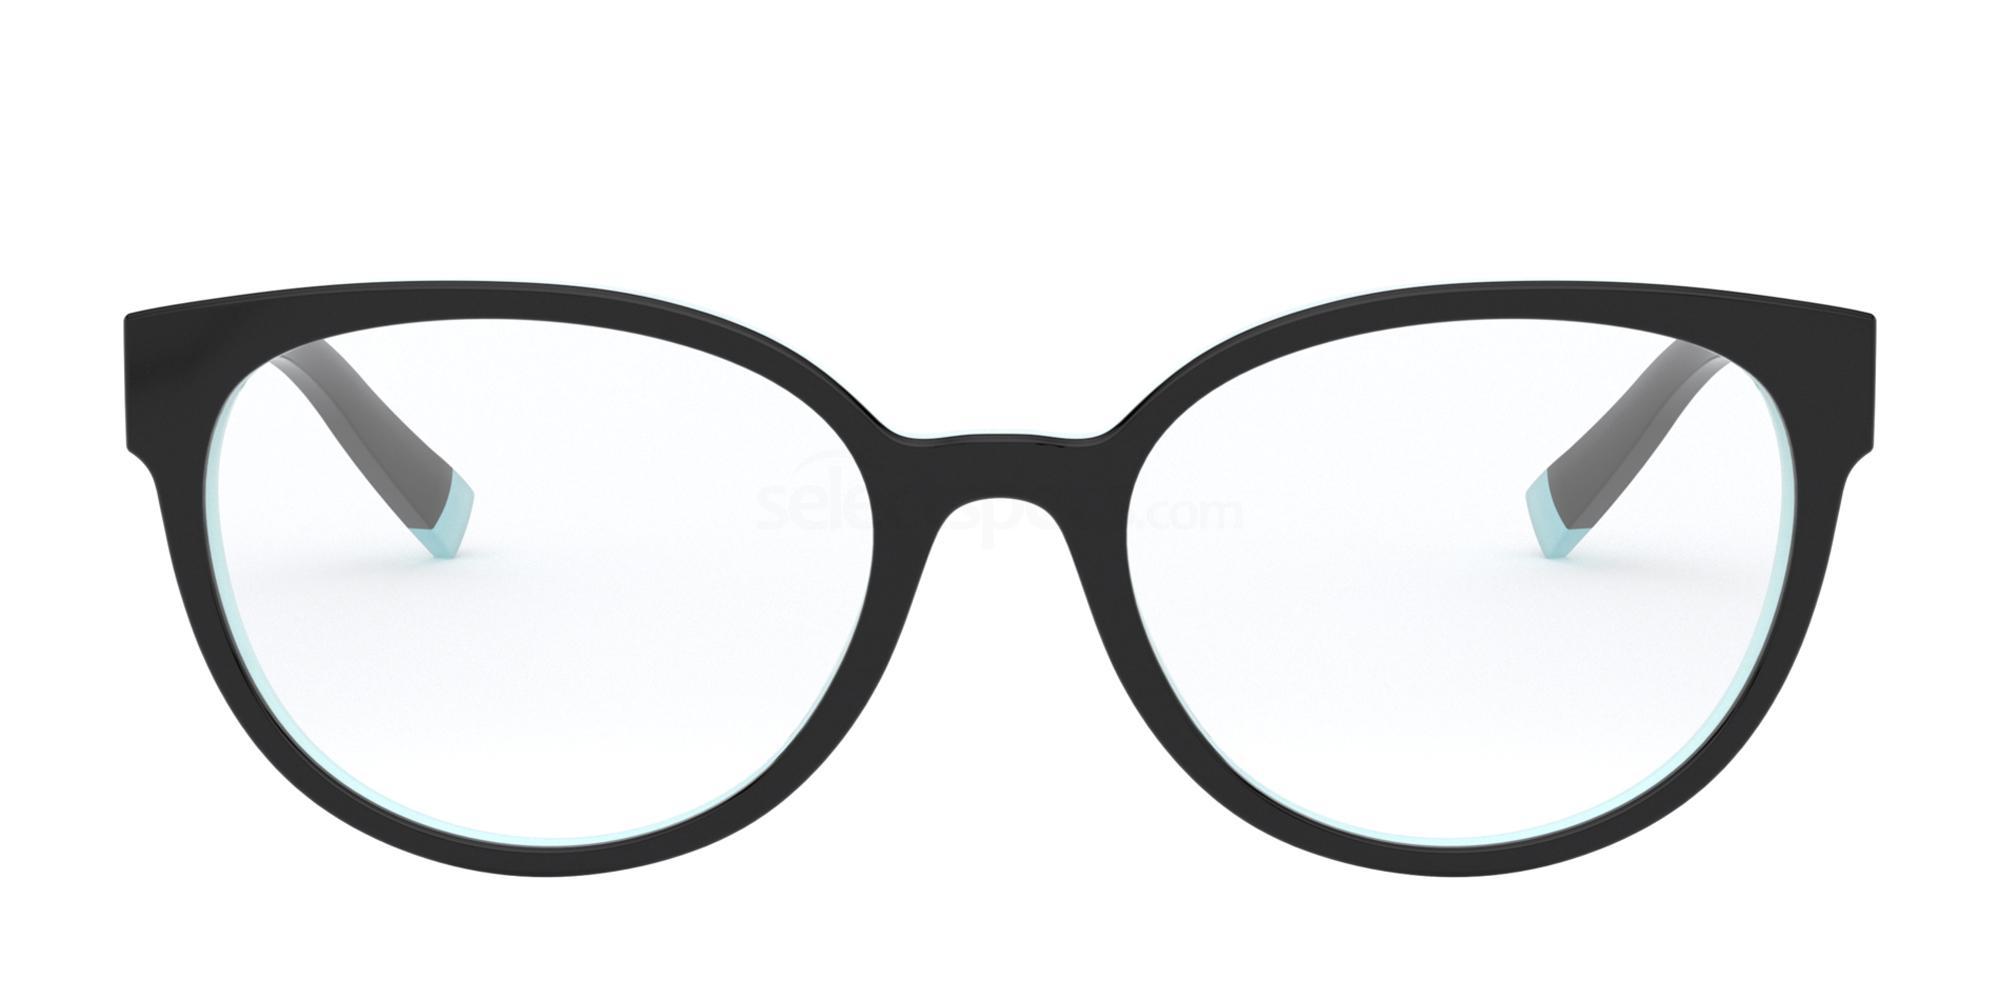 8055 TF2191 Glasses, Tiffany & Co.